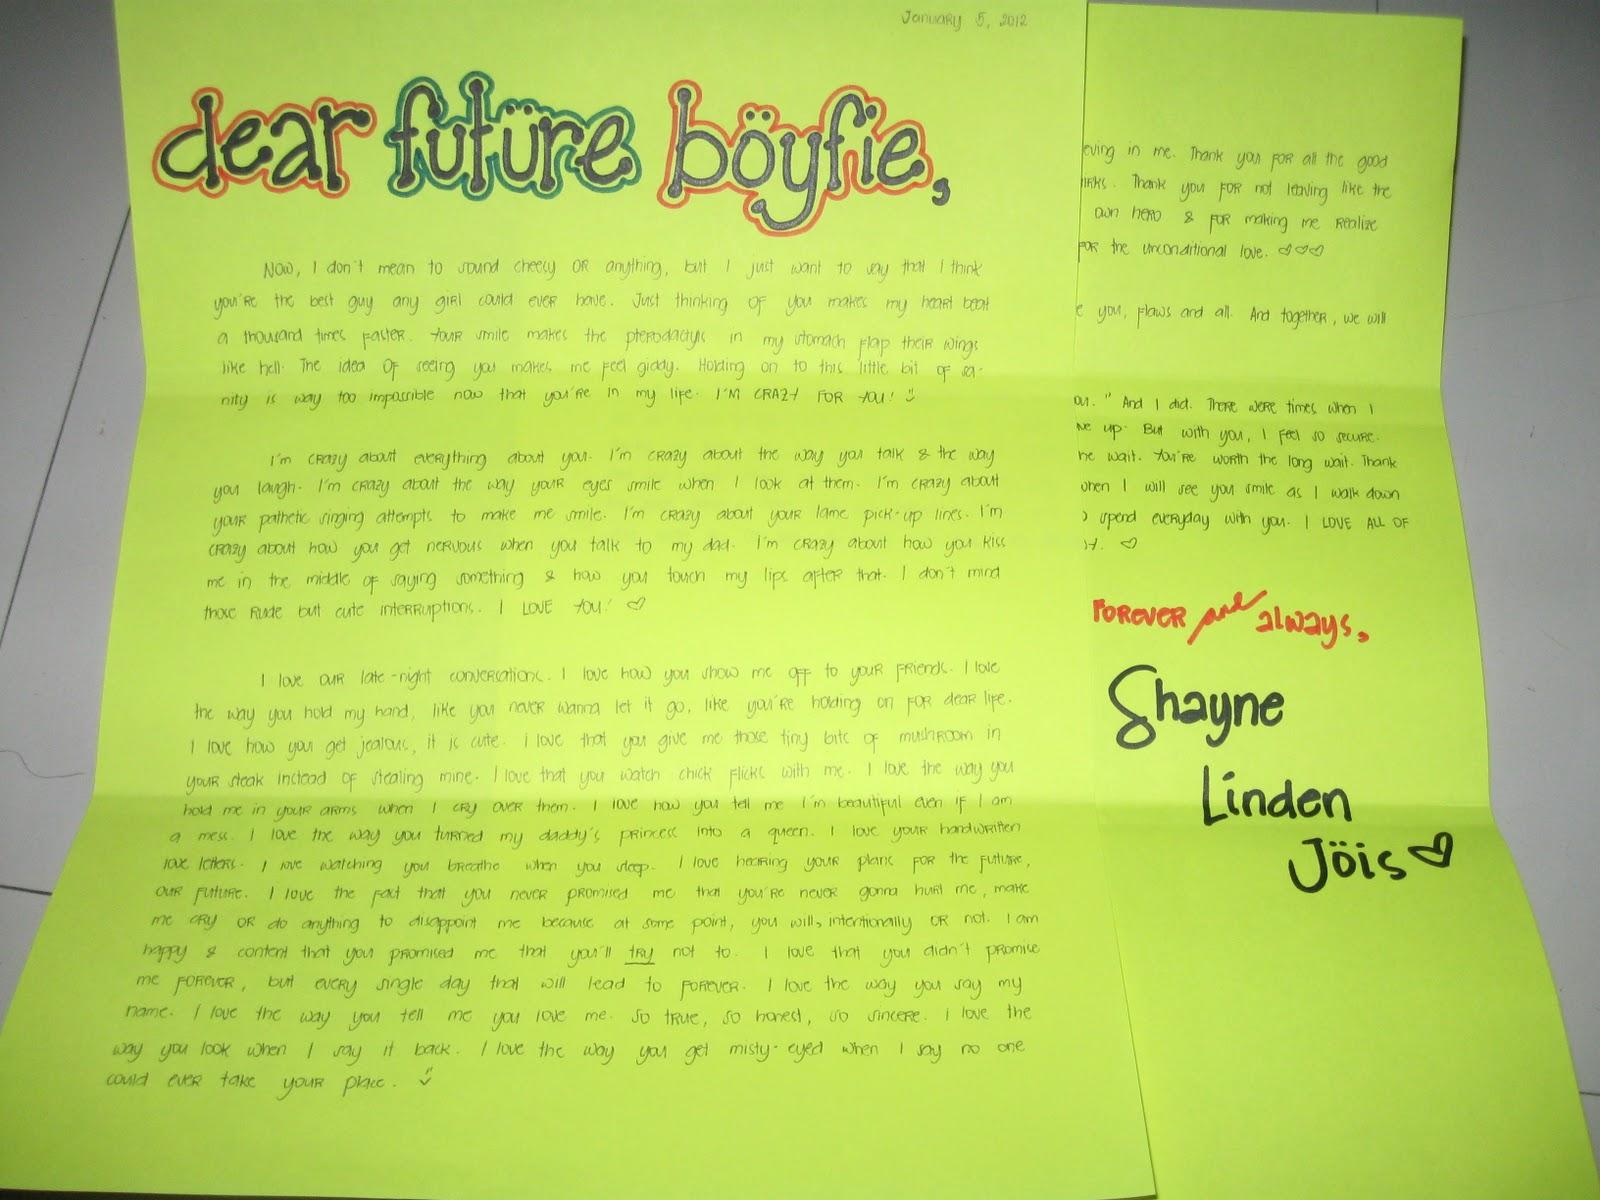 dear boyfriend letters tumblr - photo #21